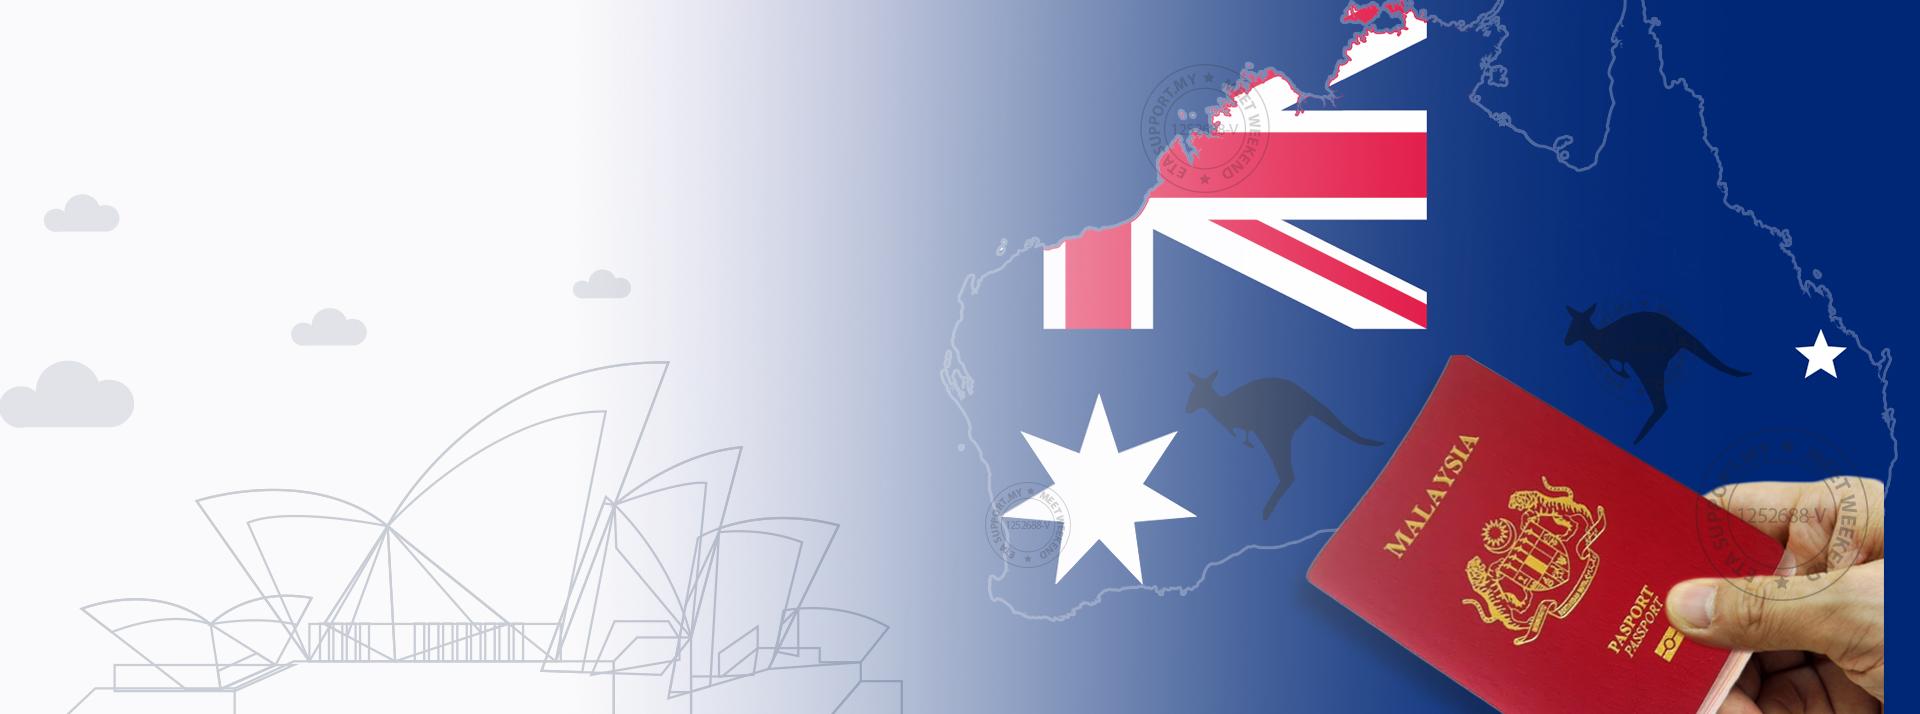 australia visa malaysia, australia eta online, australia eta visa malaysia,apply online australia eta malaysia, eta australia visa apply online, australia business visa malaysia